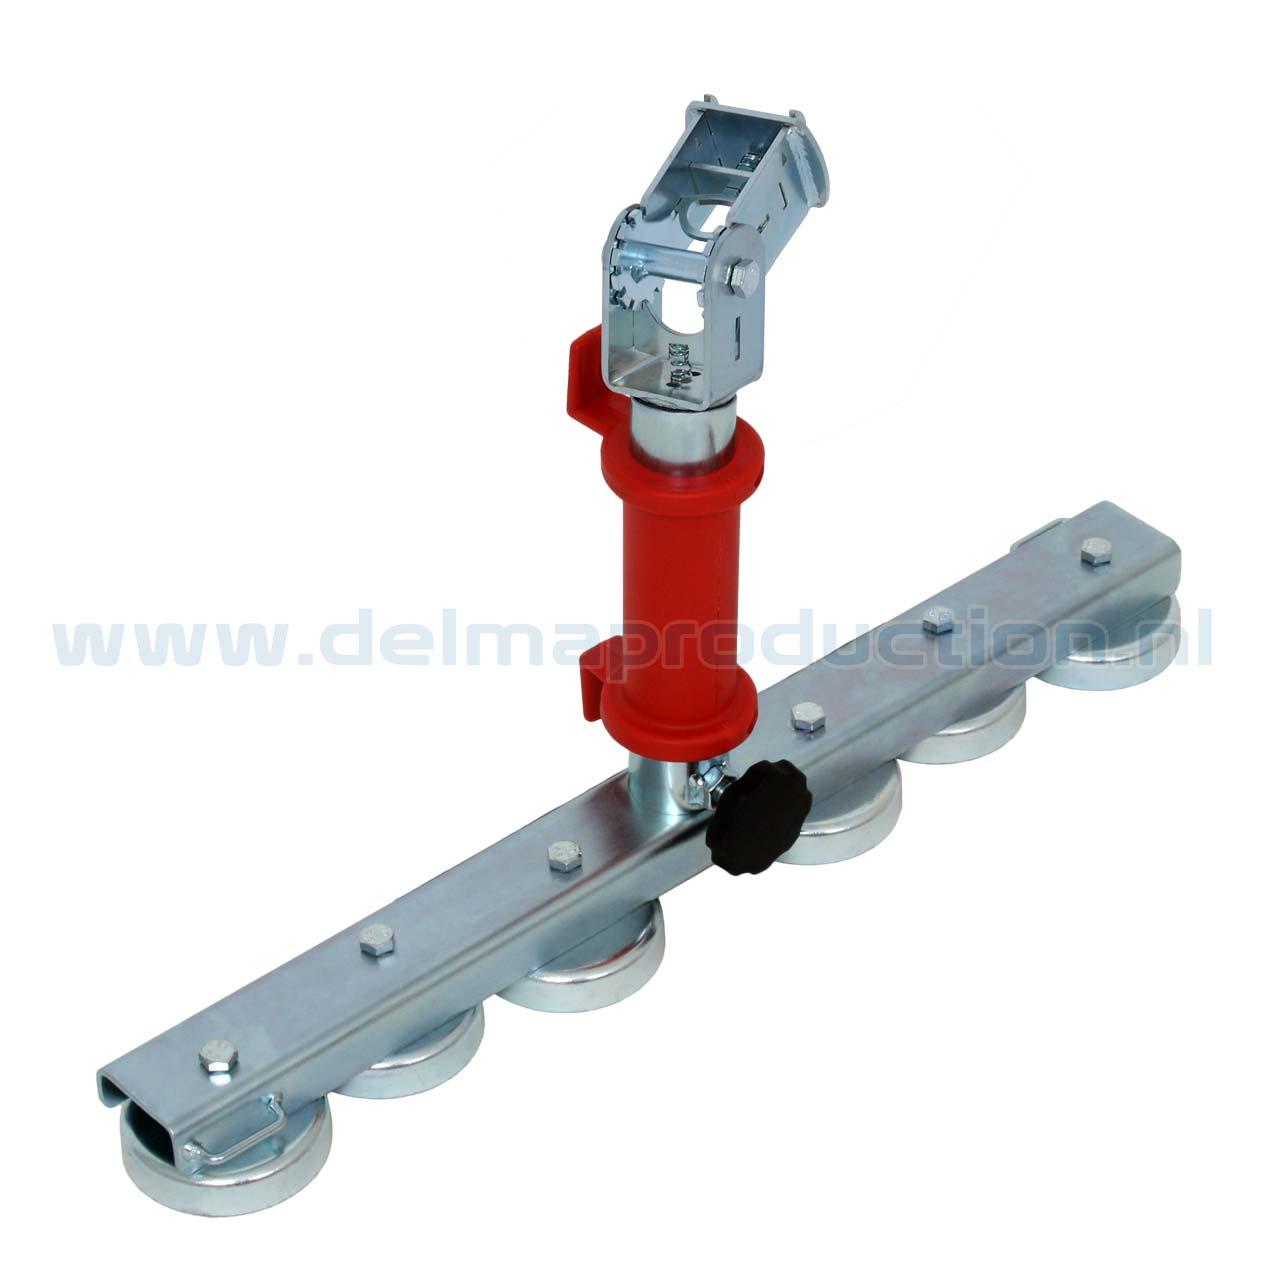 Magnet Stander mit 6 Magnete (1)